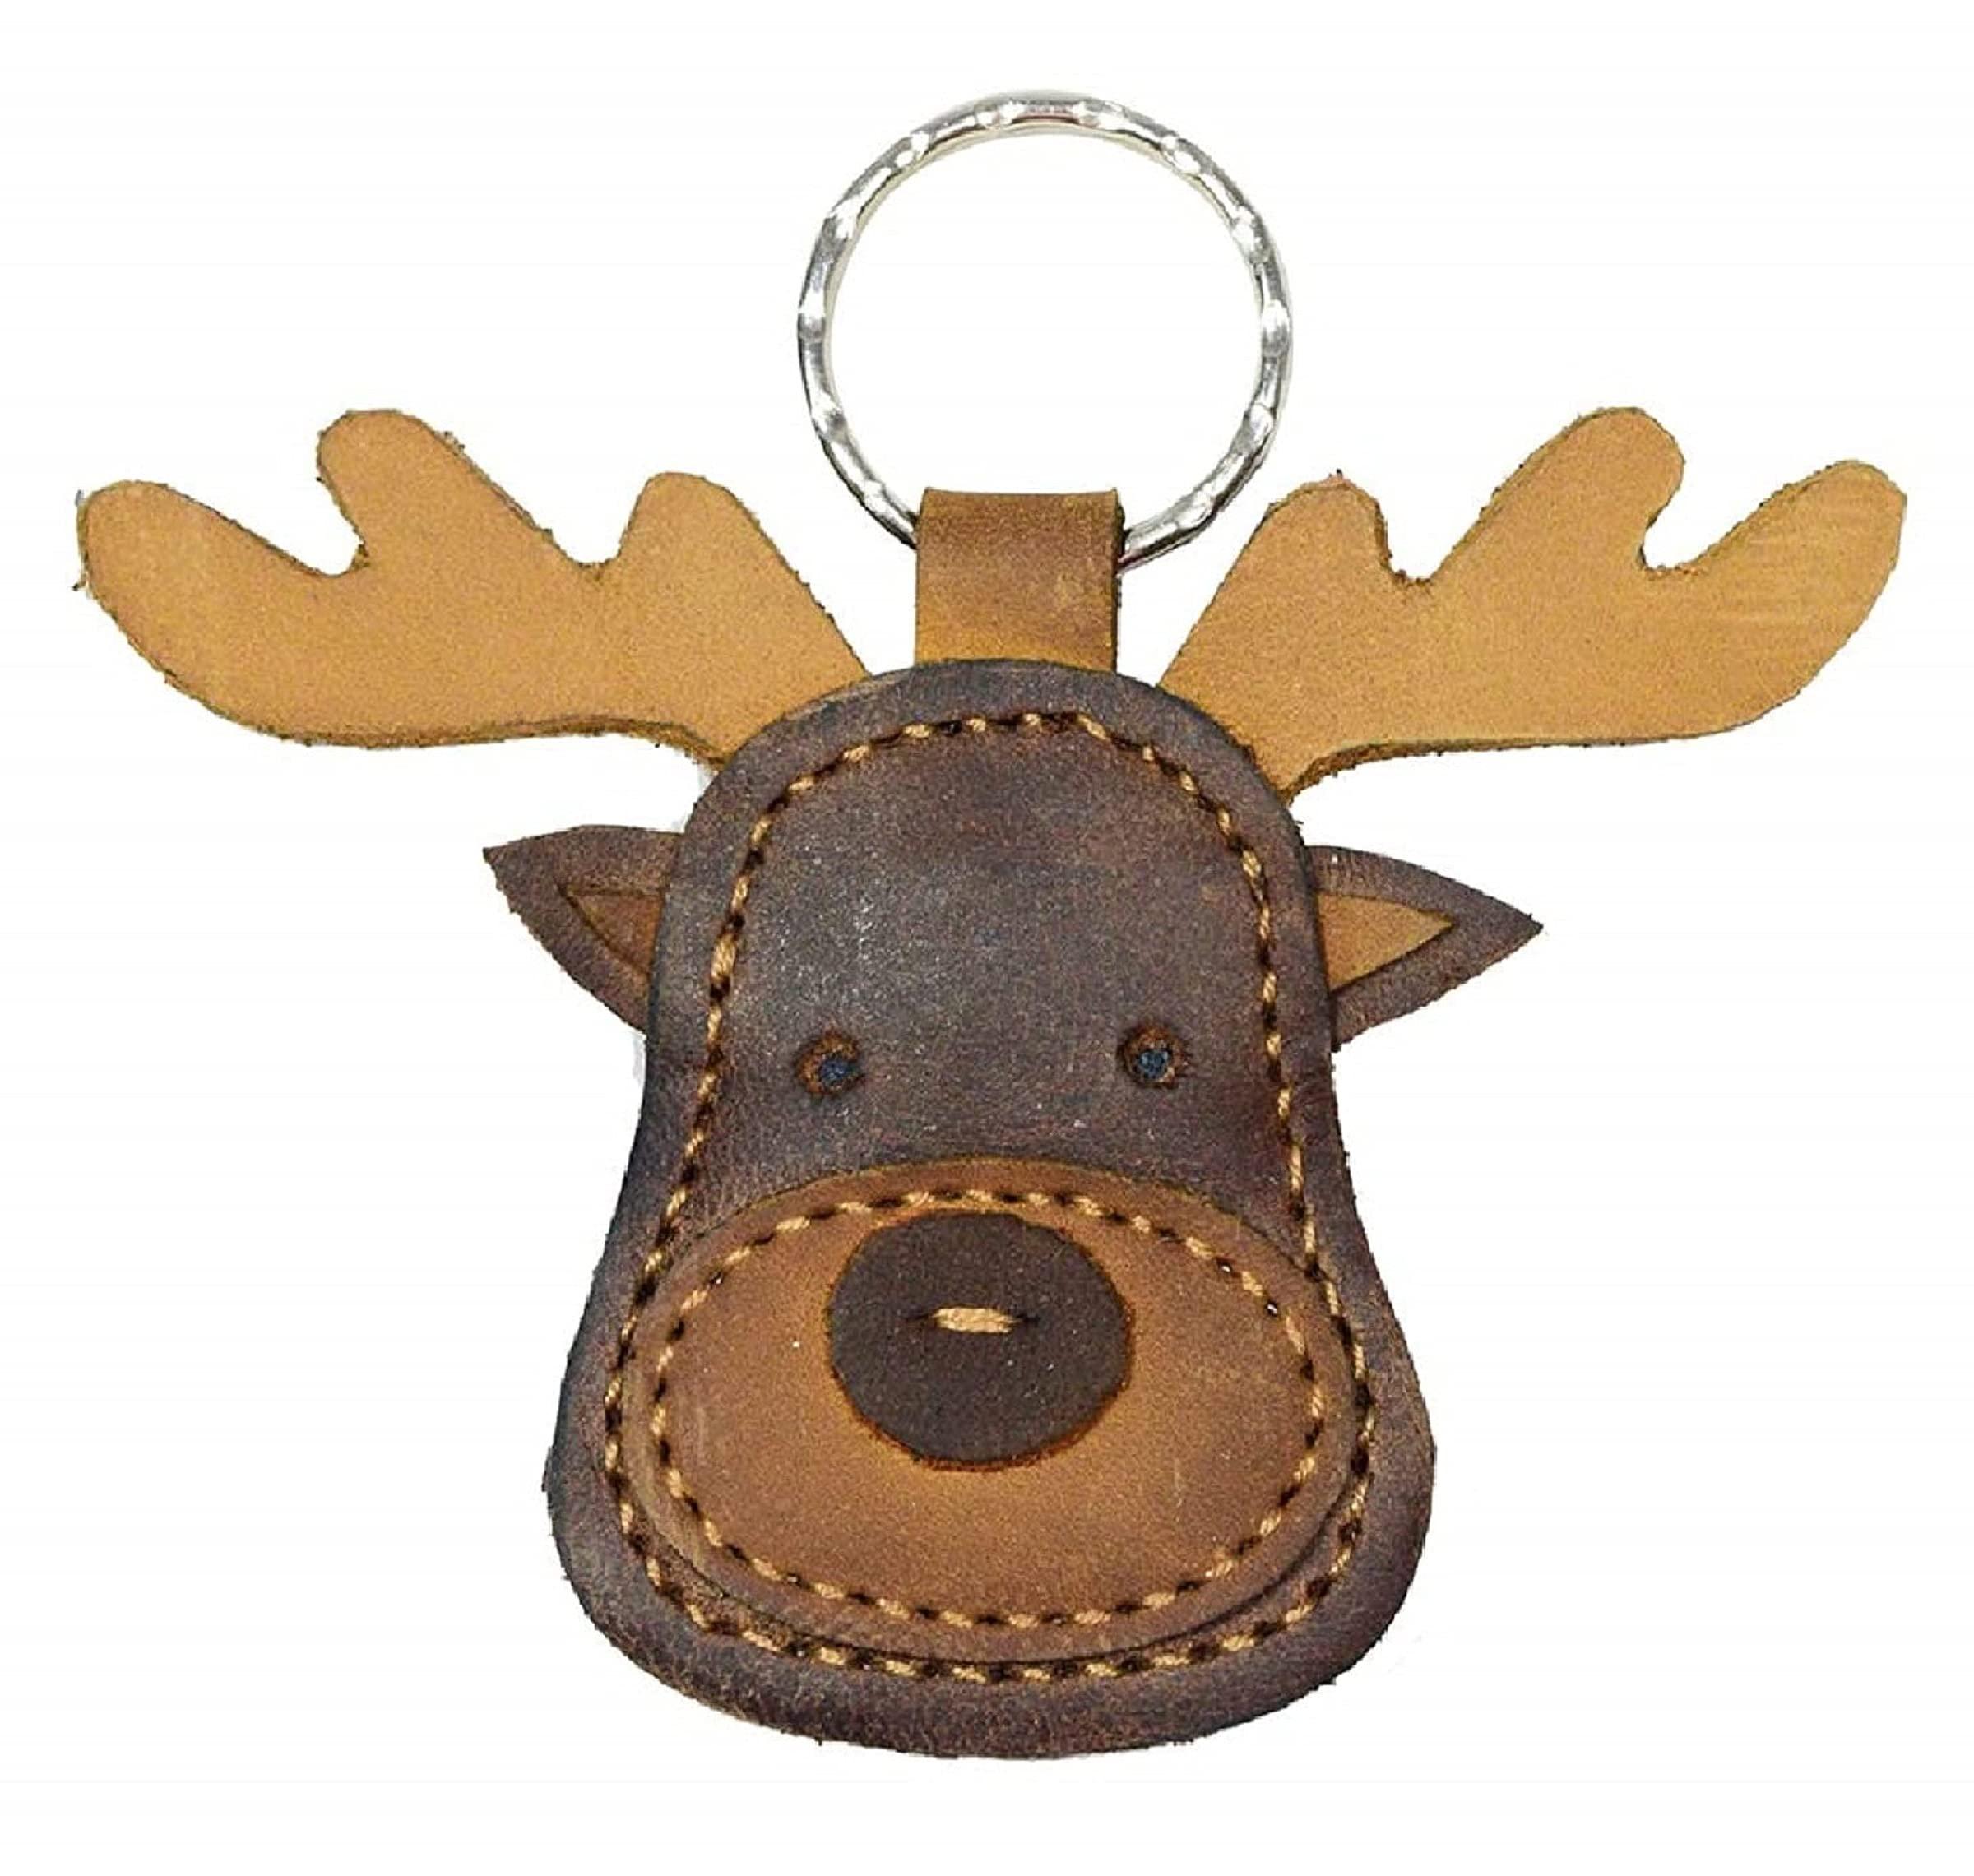 Llavero - Hide & Drink  Leather Moose Keychain / Stuffed Ani